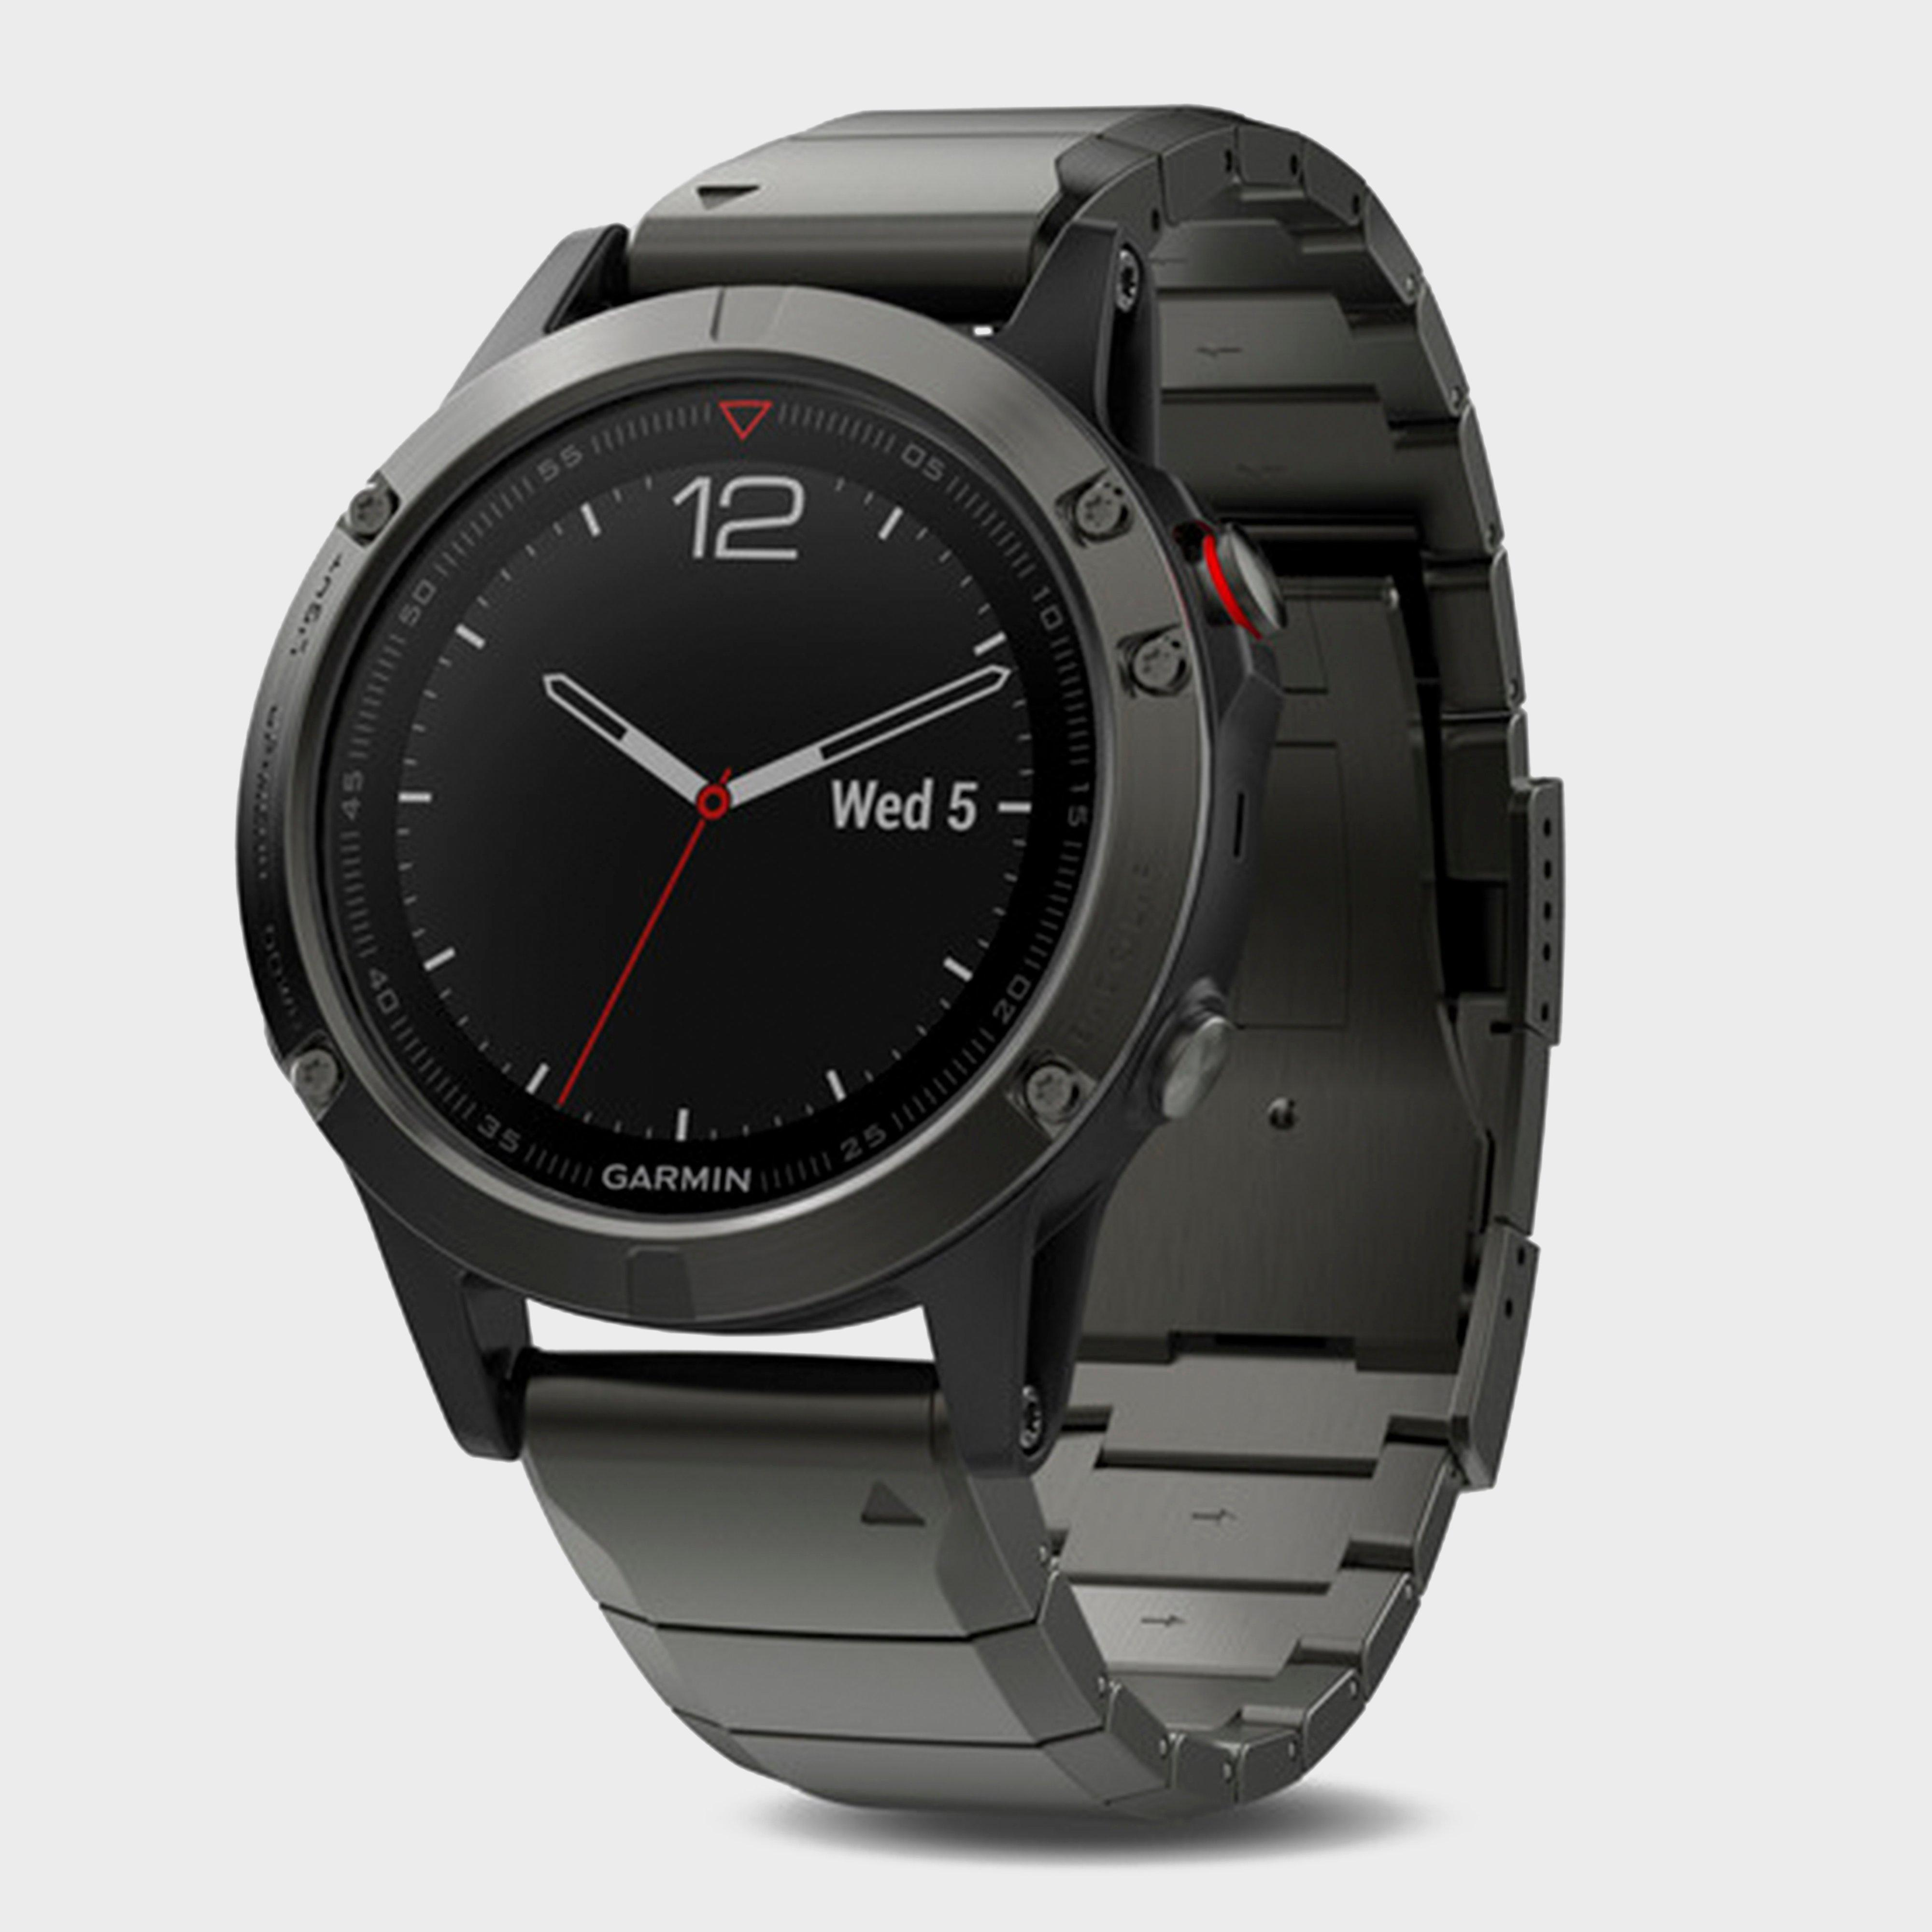 Garmin Fenix 5 Sapphire Multi-Sport GPS Watch With Metal Band, Dark Grey/Dark Grey